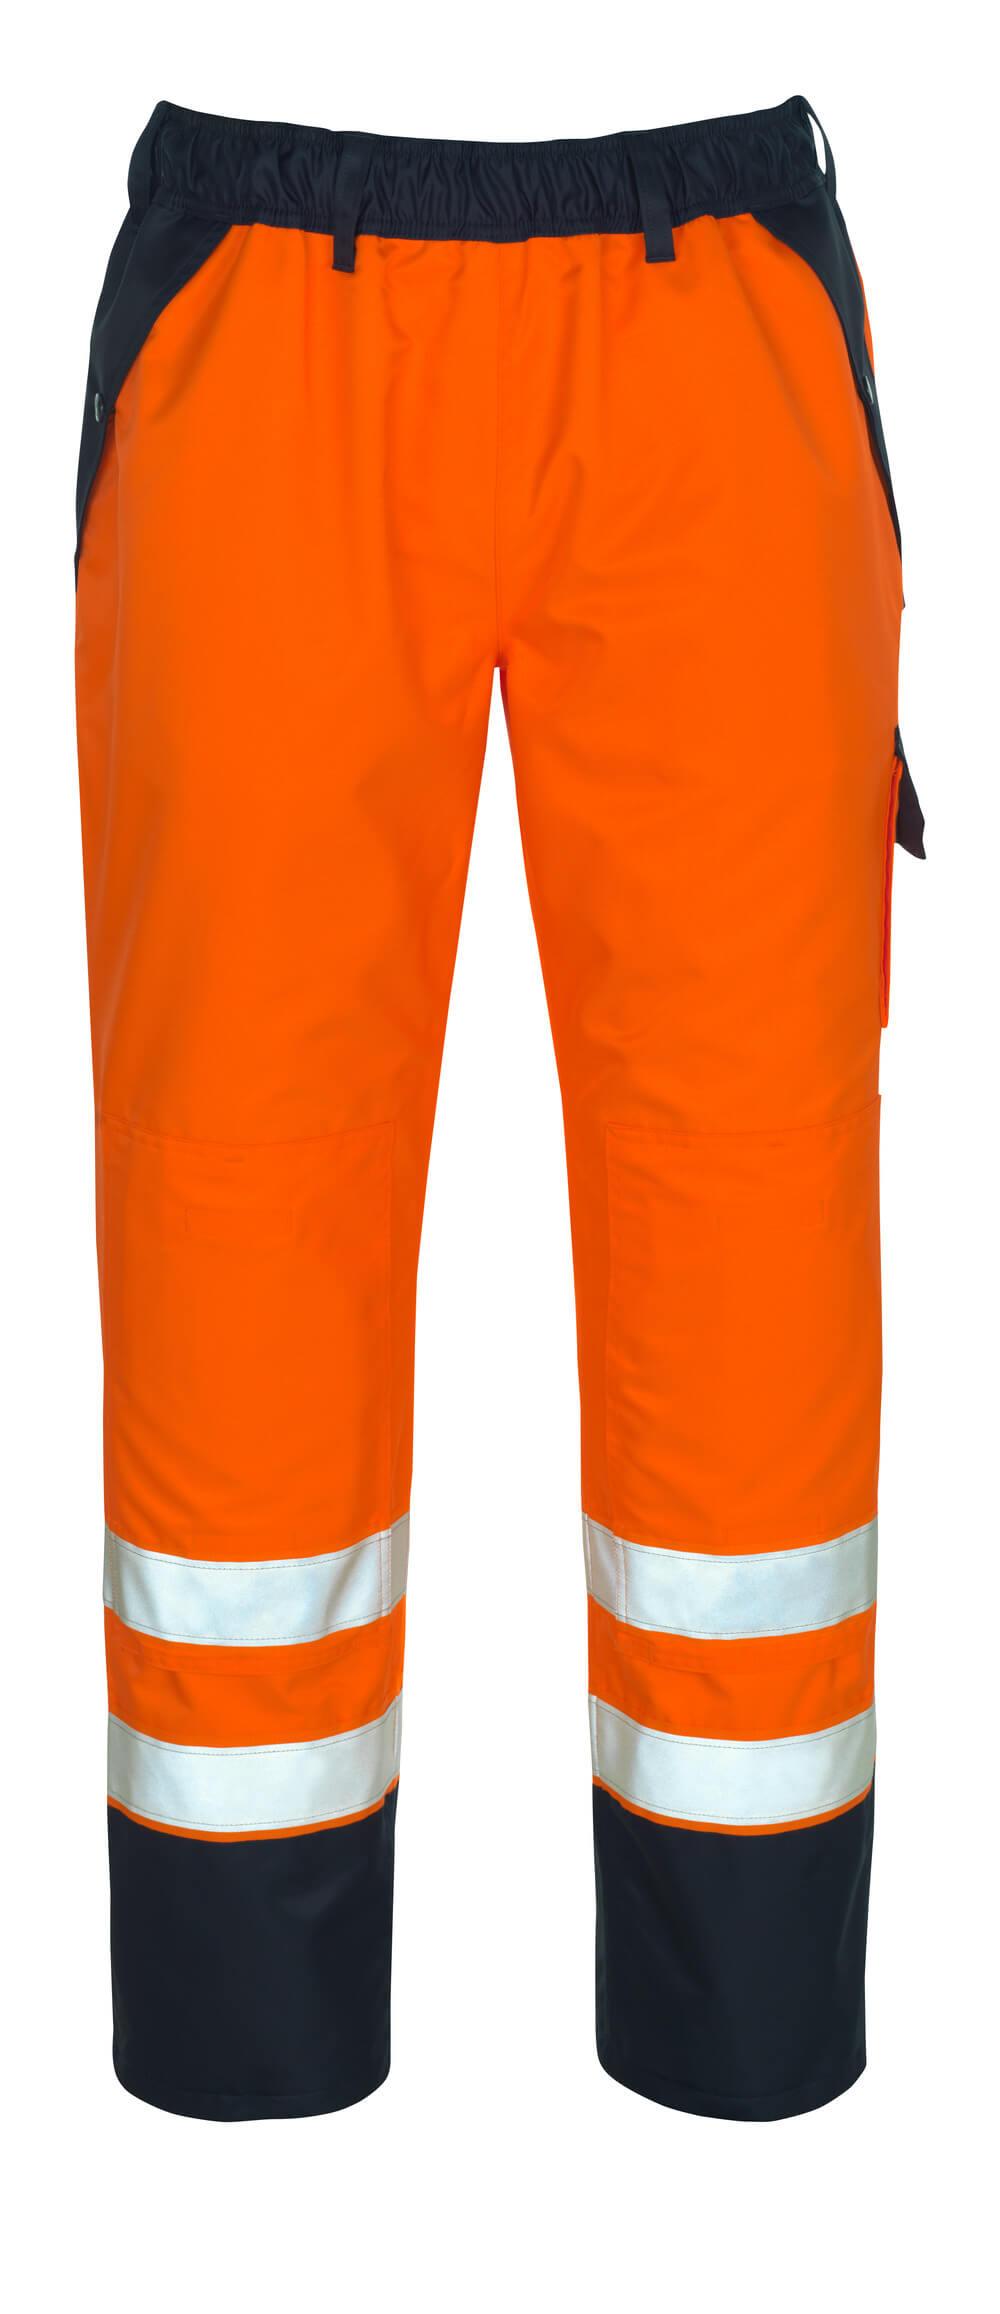 07090-880-141 Over Trousers - hi-vis orange/navy